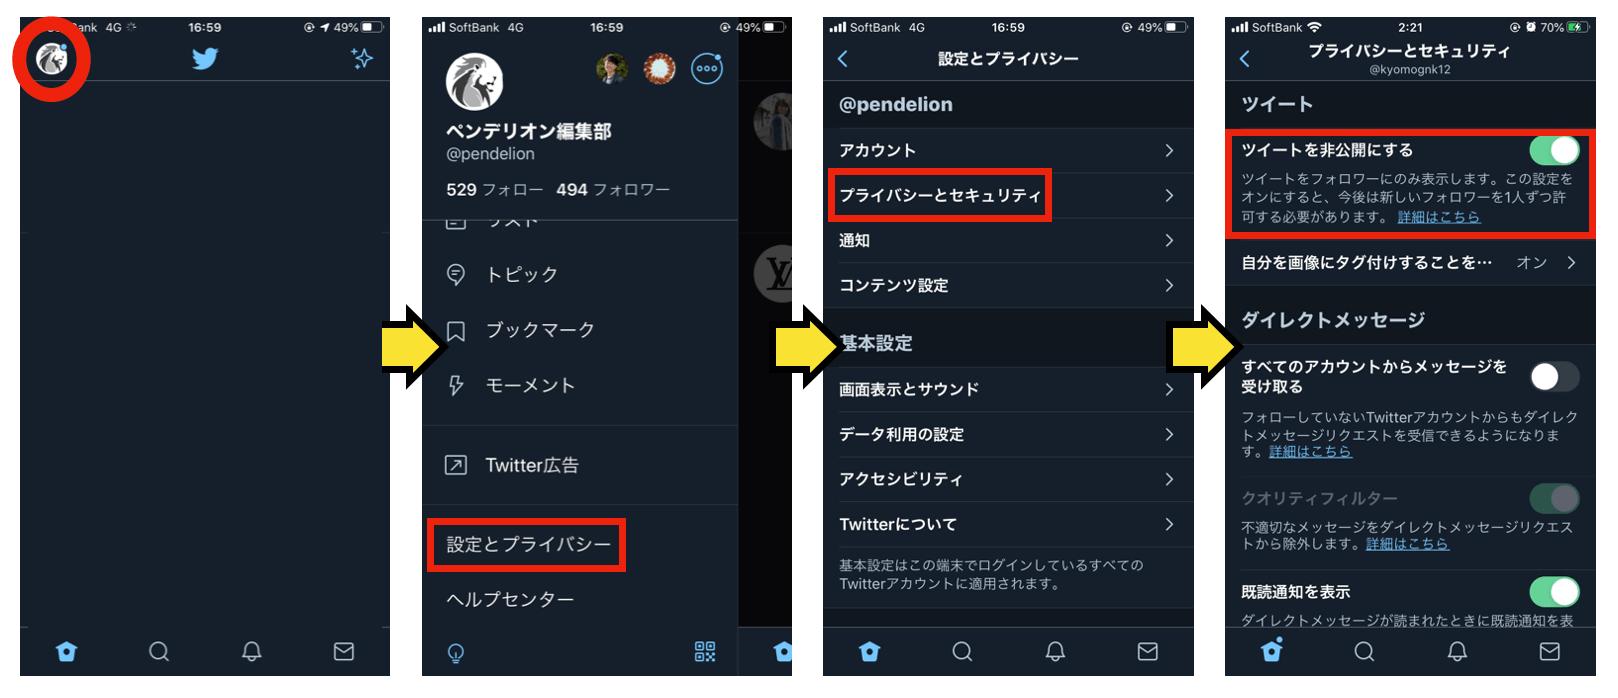 Twitter 鍵垢のやり方